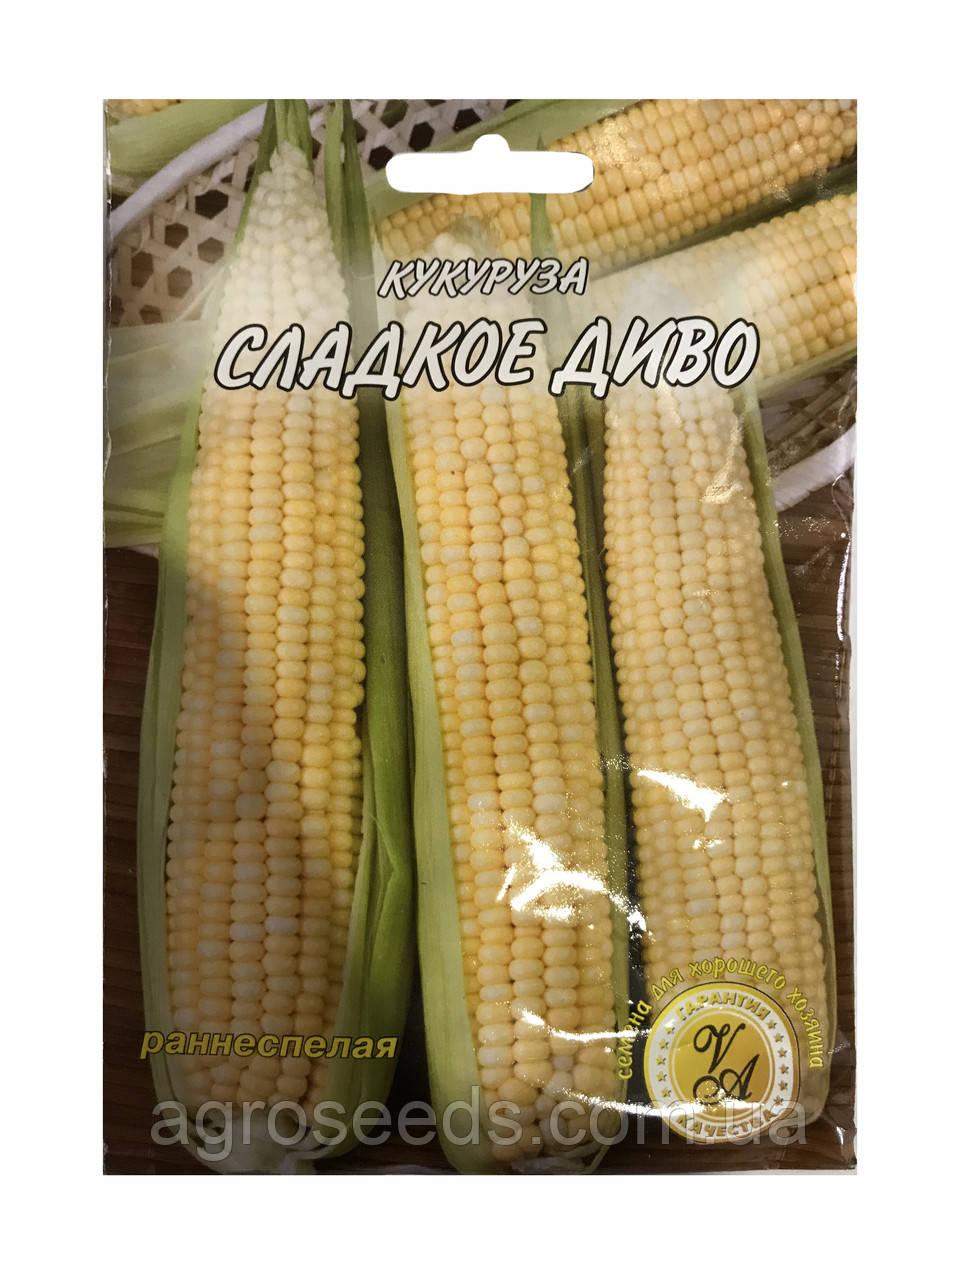 Семена кукурузы Сладкое Диво 20 г